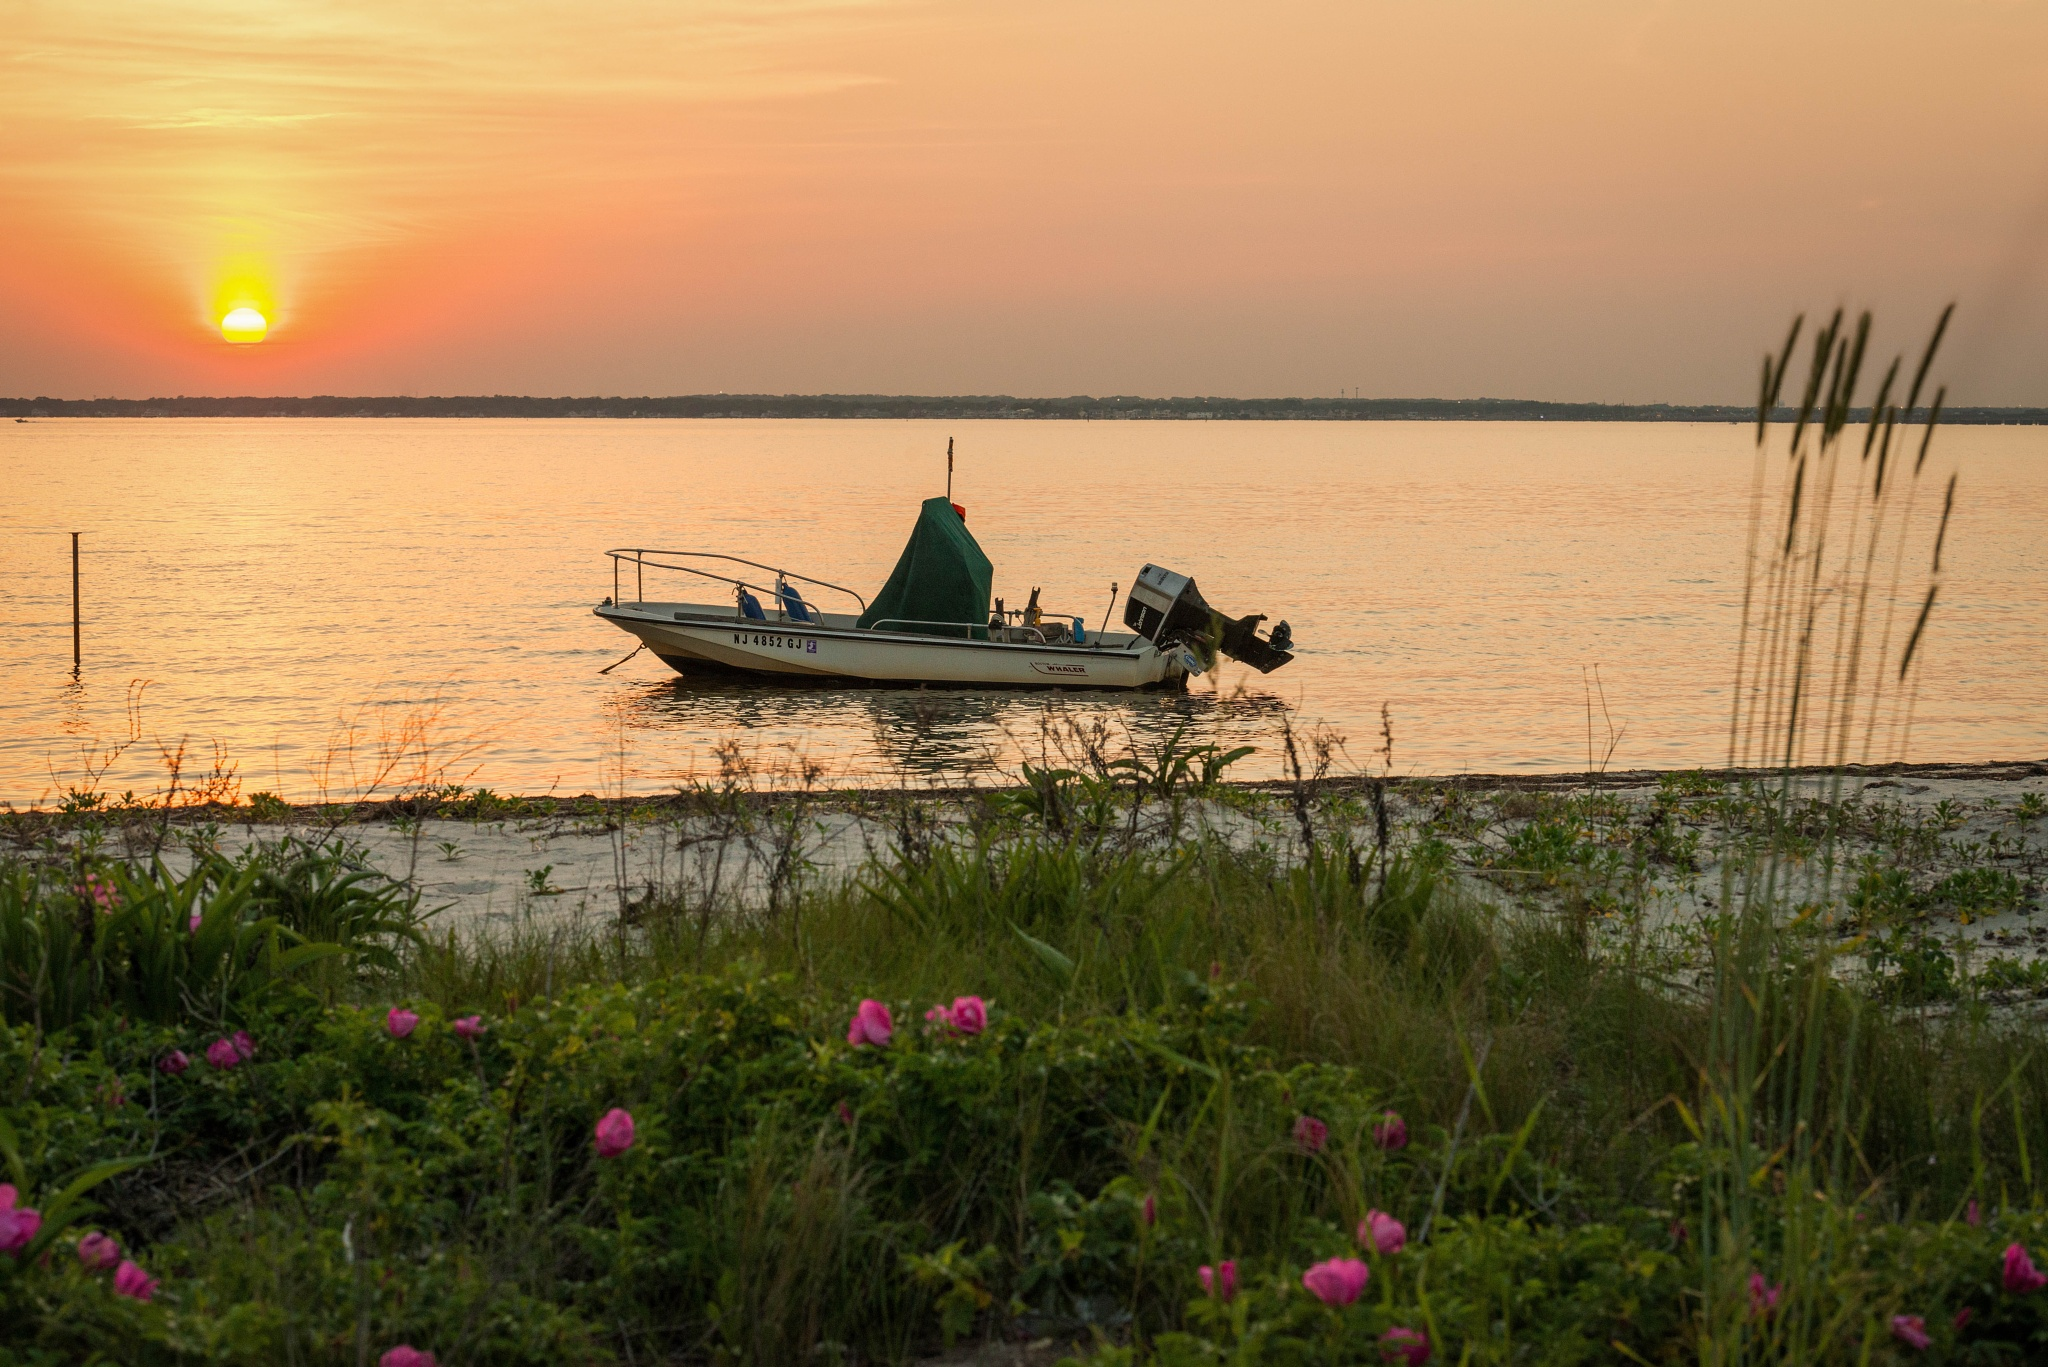 Boston Whaler Sunset by Edmund Dworakowski